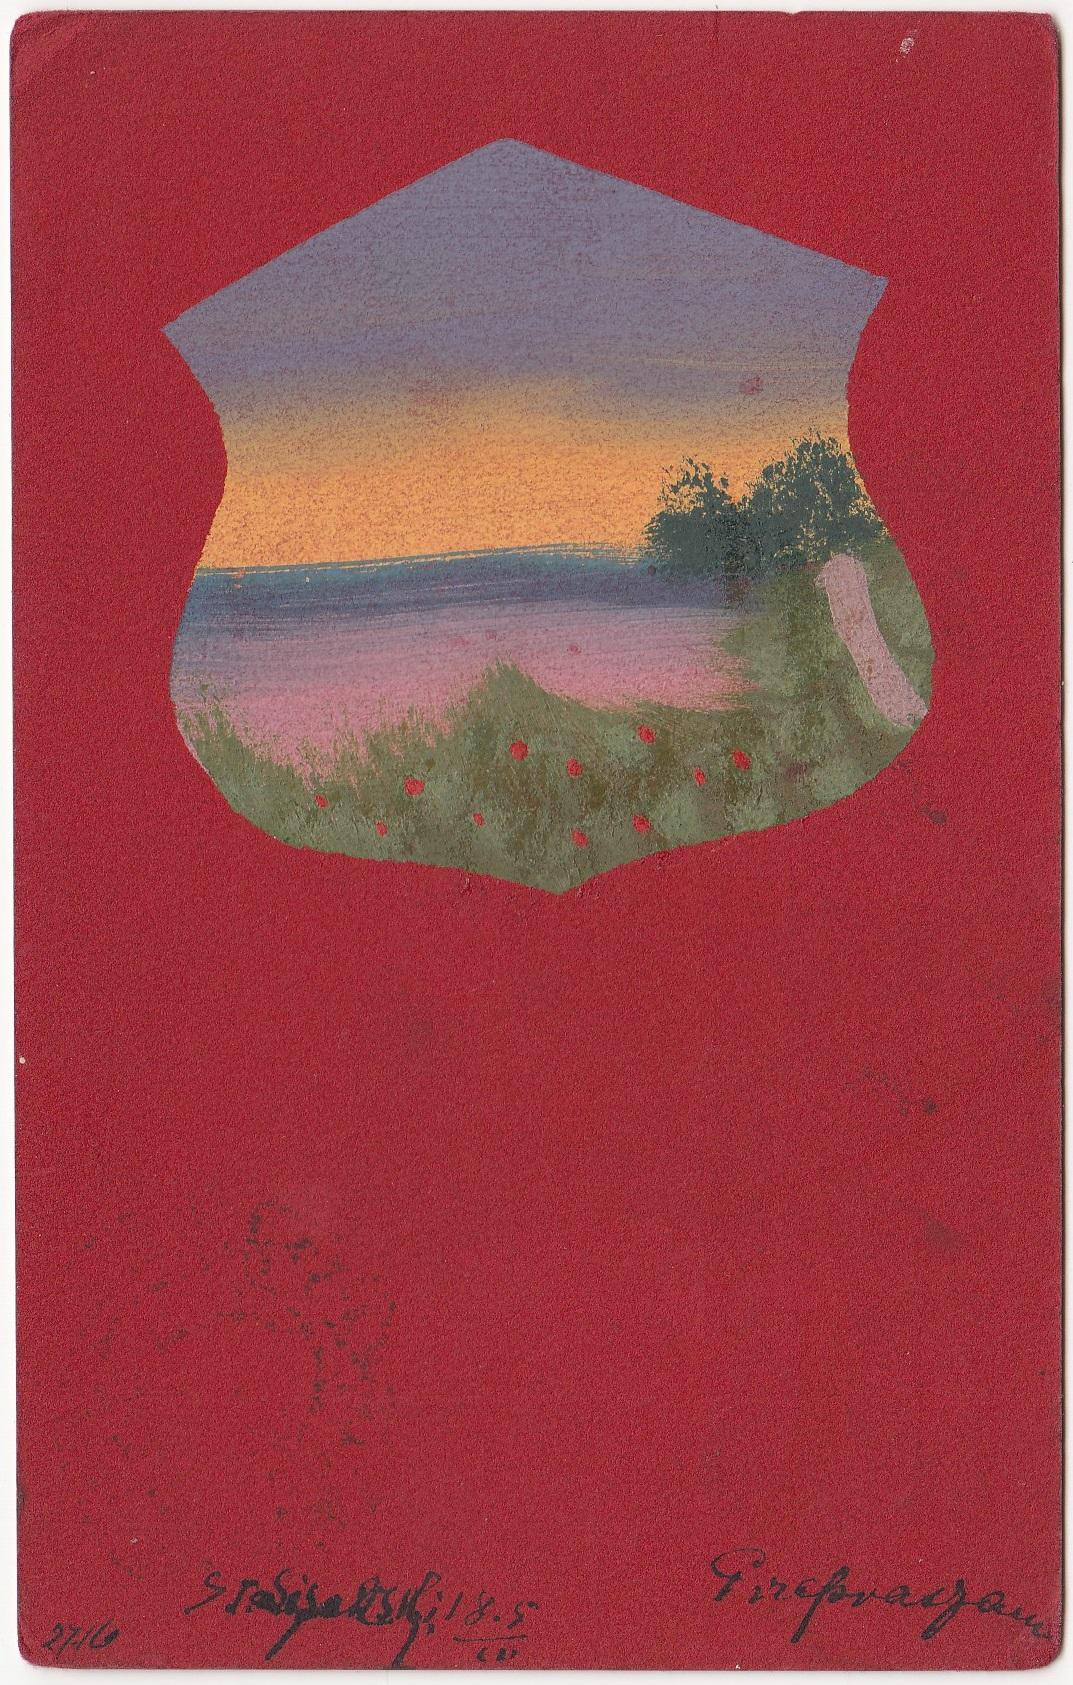 Malarstwo (1905)